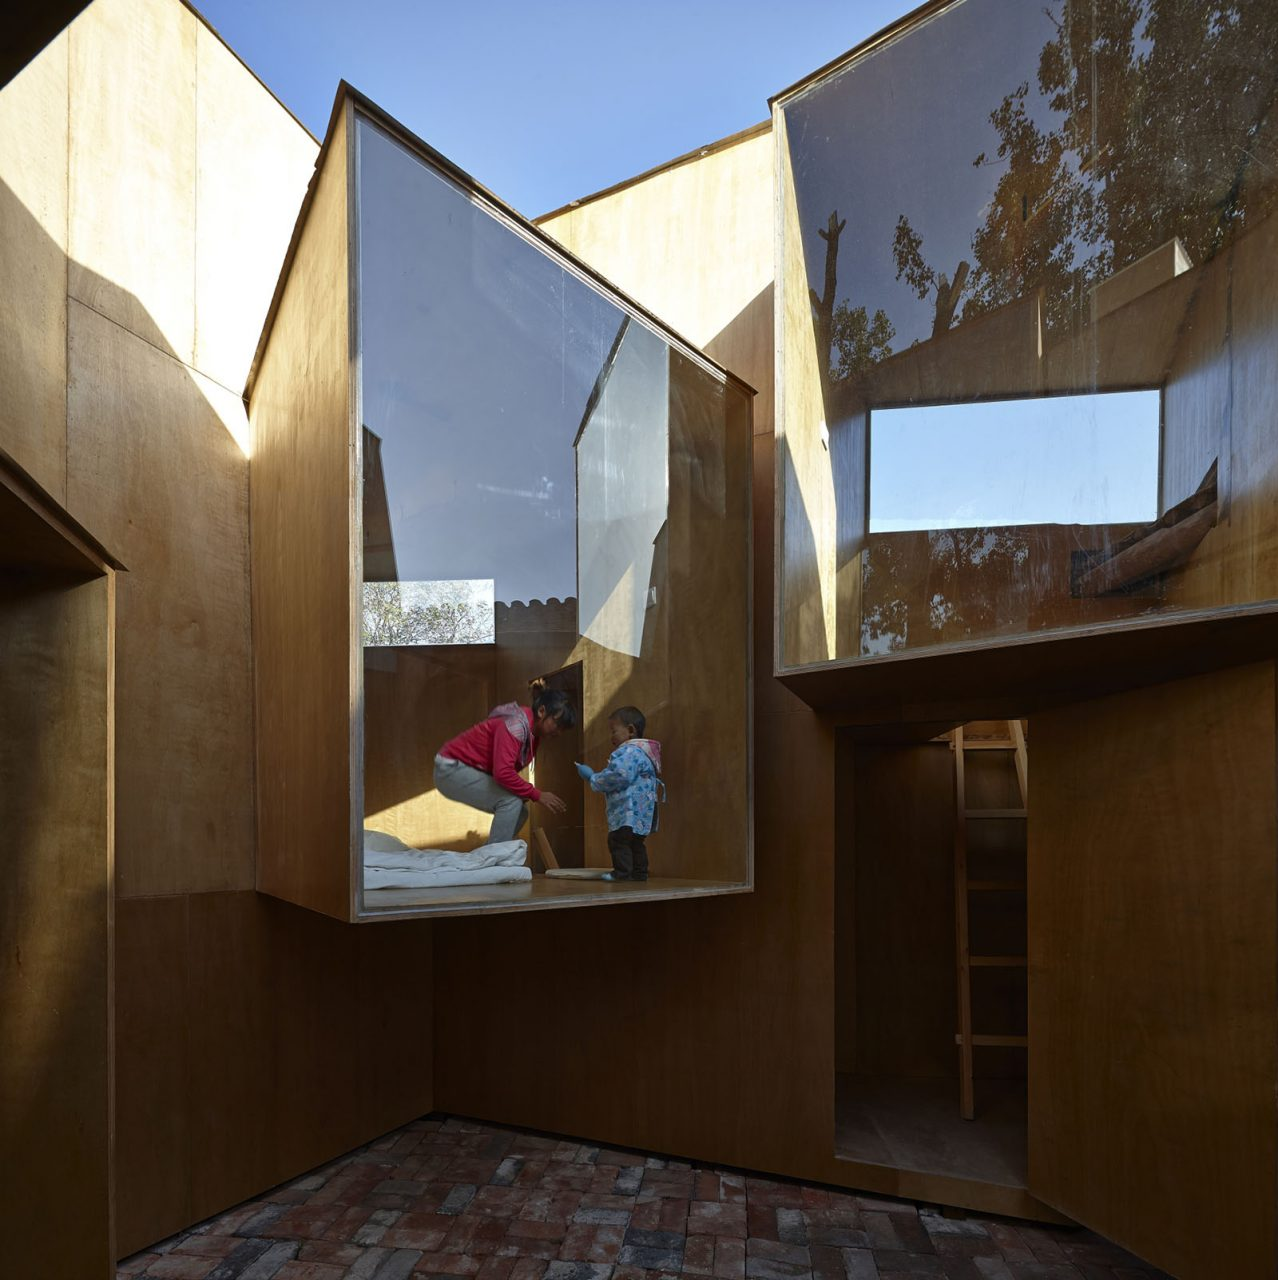 Bielefelder Kunstverein. Micro-Hutong in Bejing von ZAO/standardarchitecture (2013).